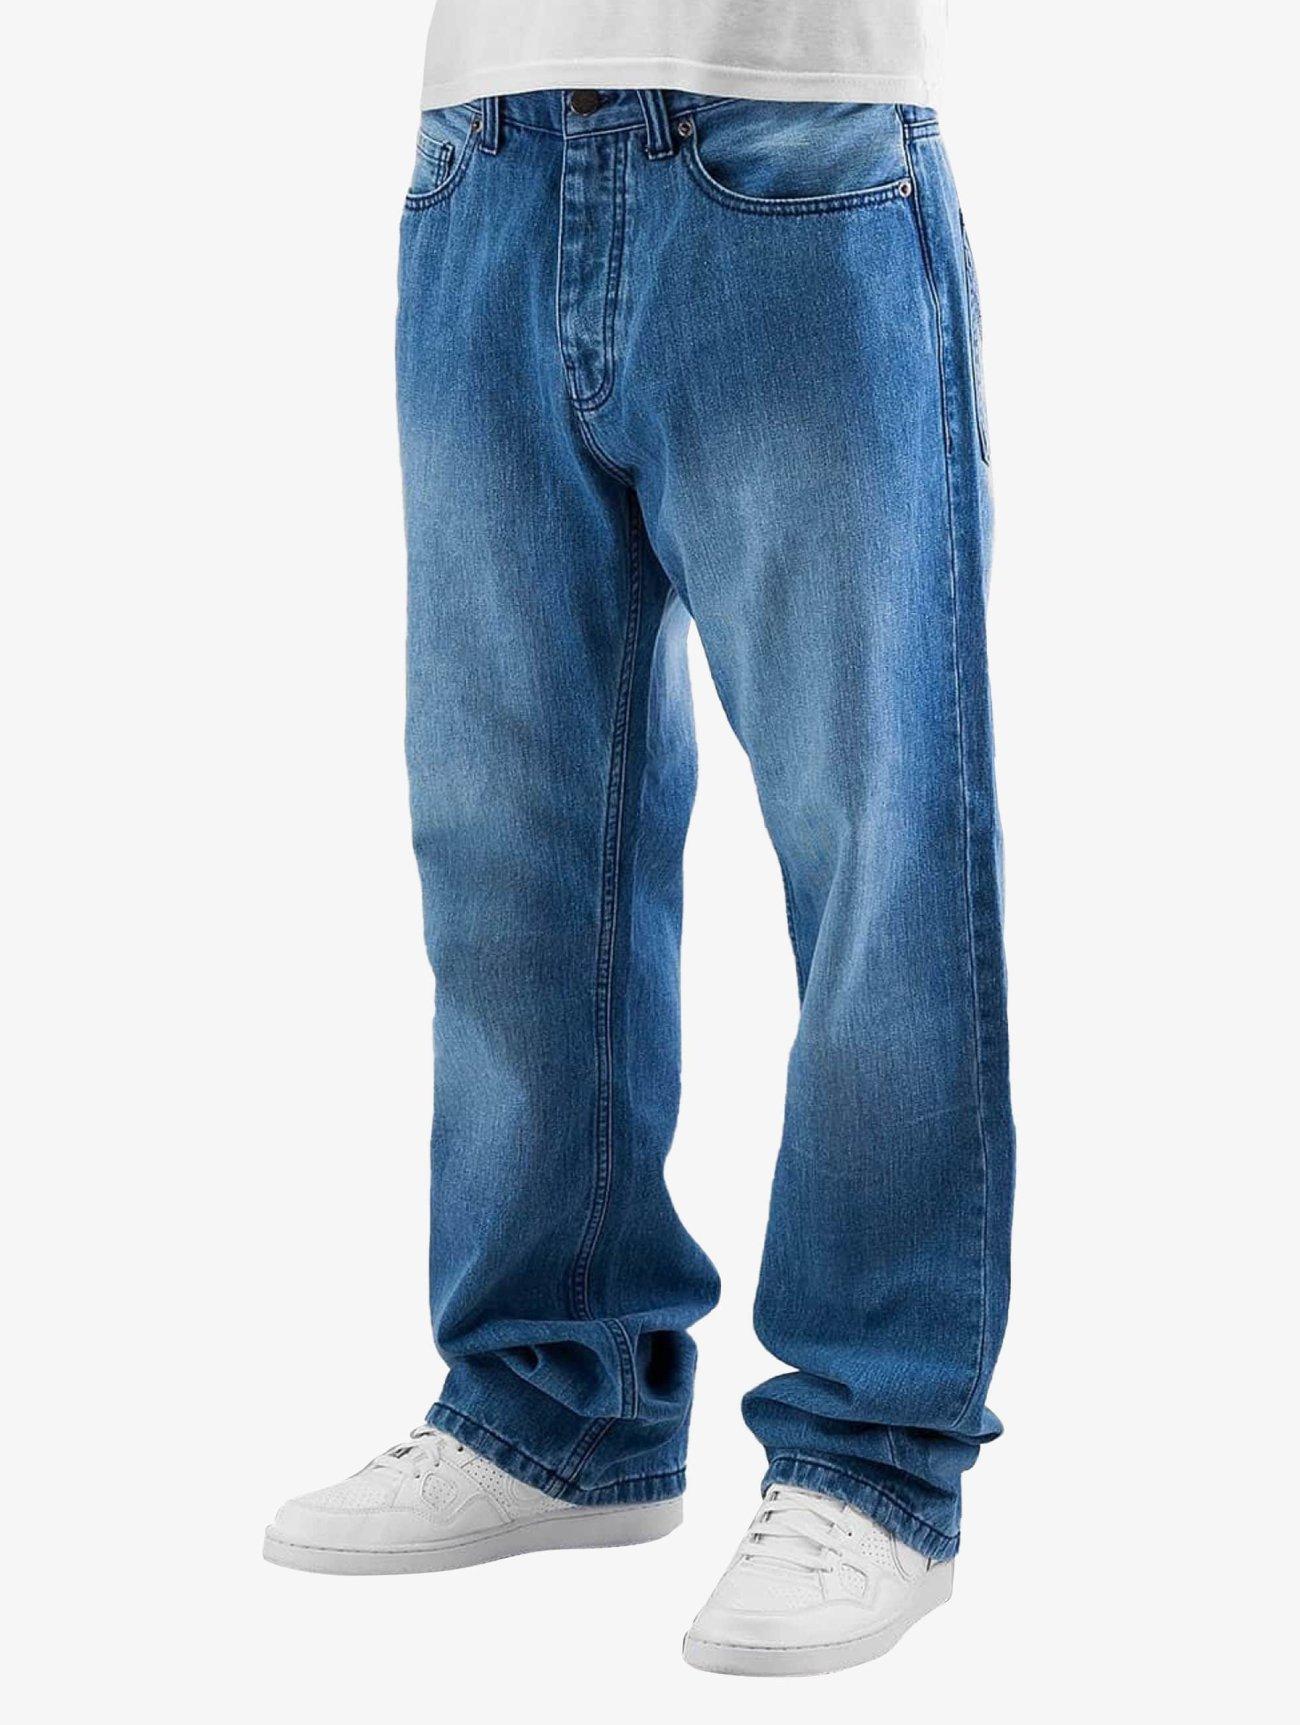 Dickies Pensacola bleu Homme Jean large 266498 Homme Jeans